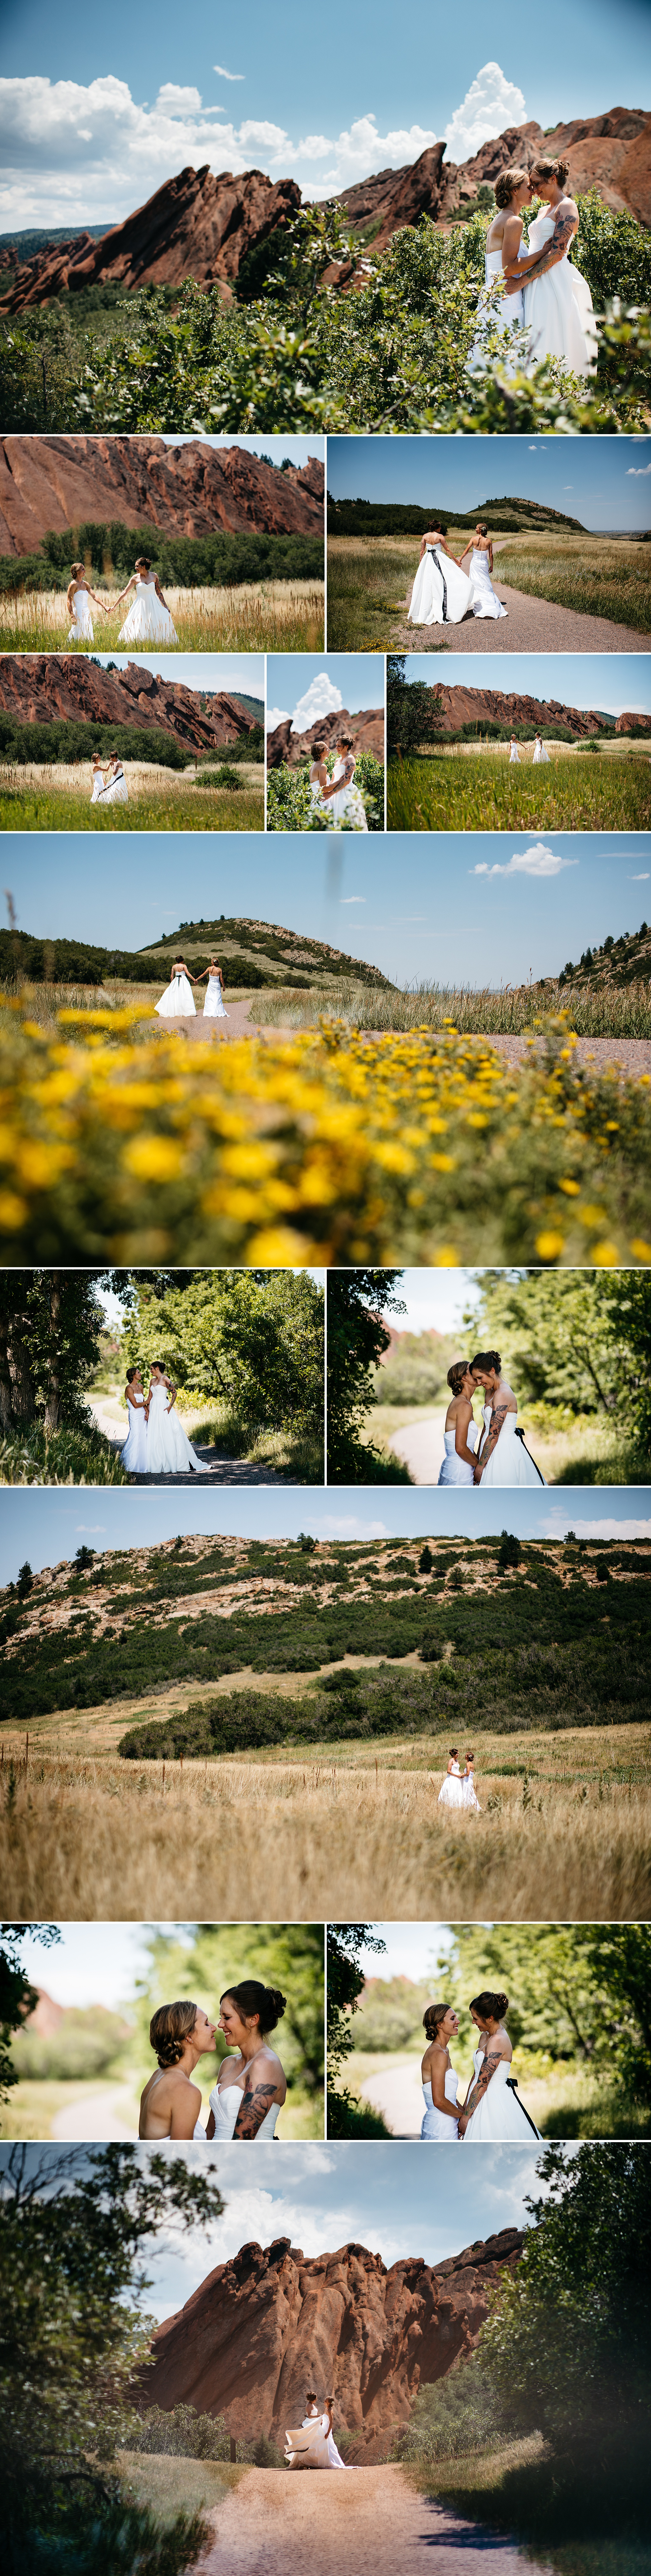 Denver-LGBTQ-Wedding-Photographer-5_WEB.jpg